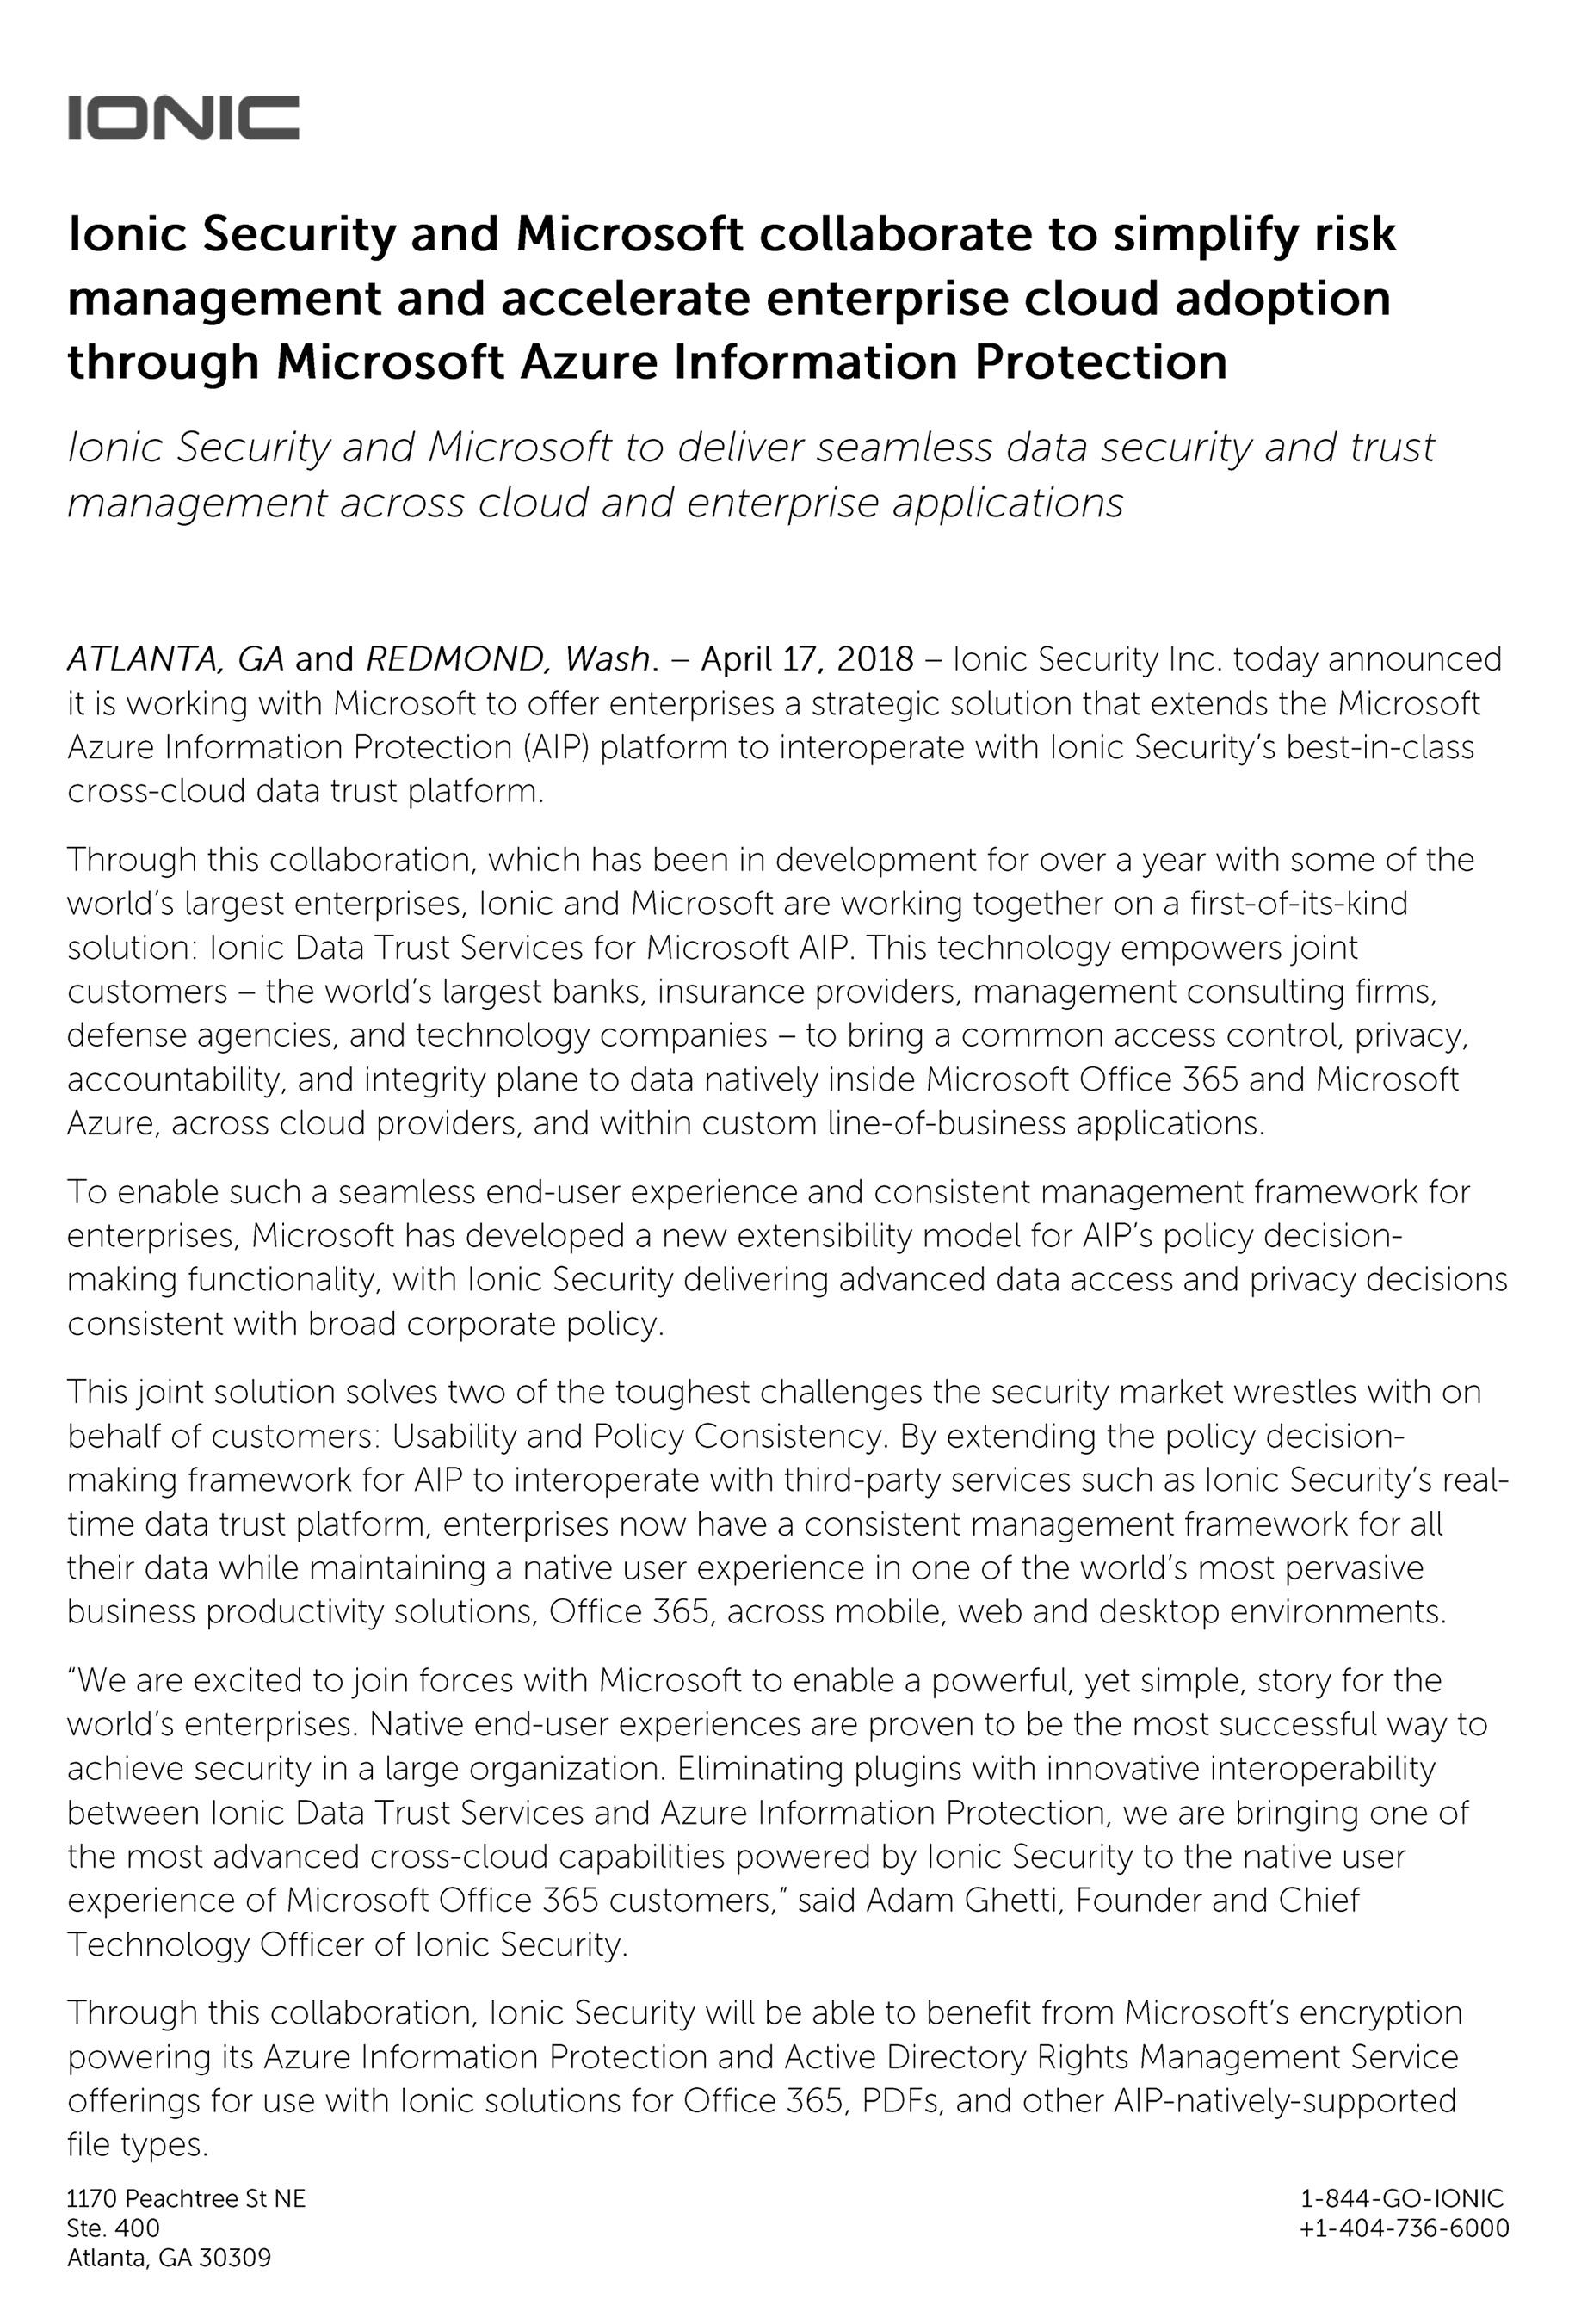 ionic announces cross cloud data trust ecosystem